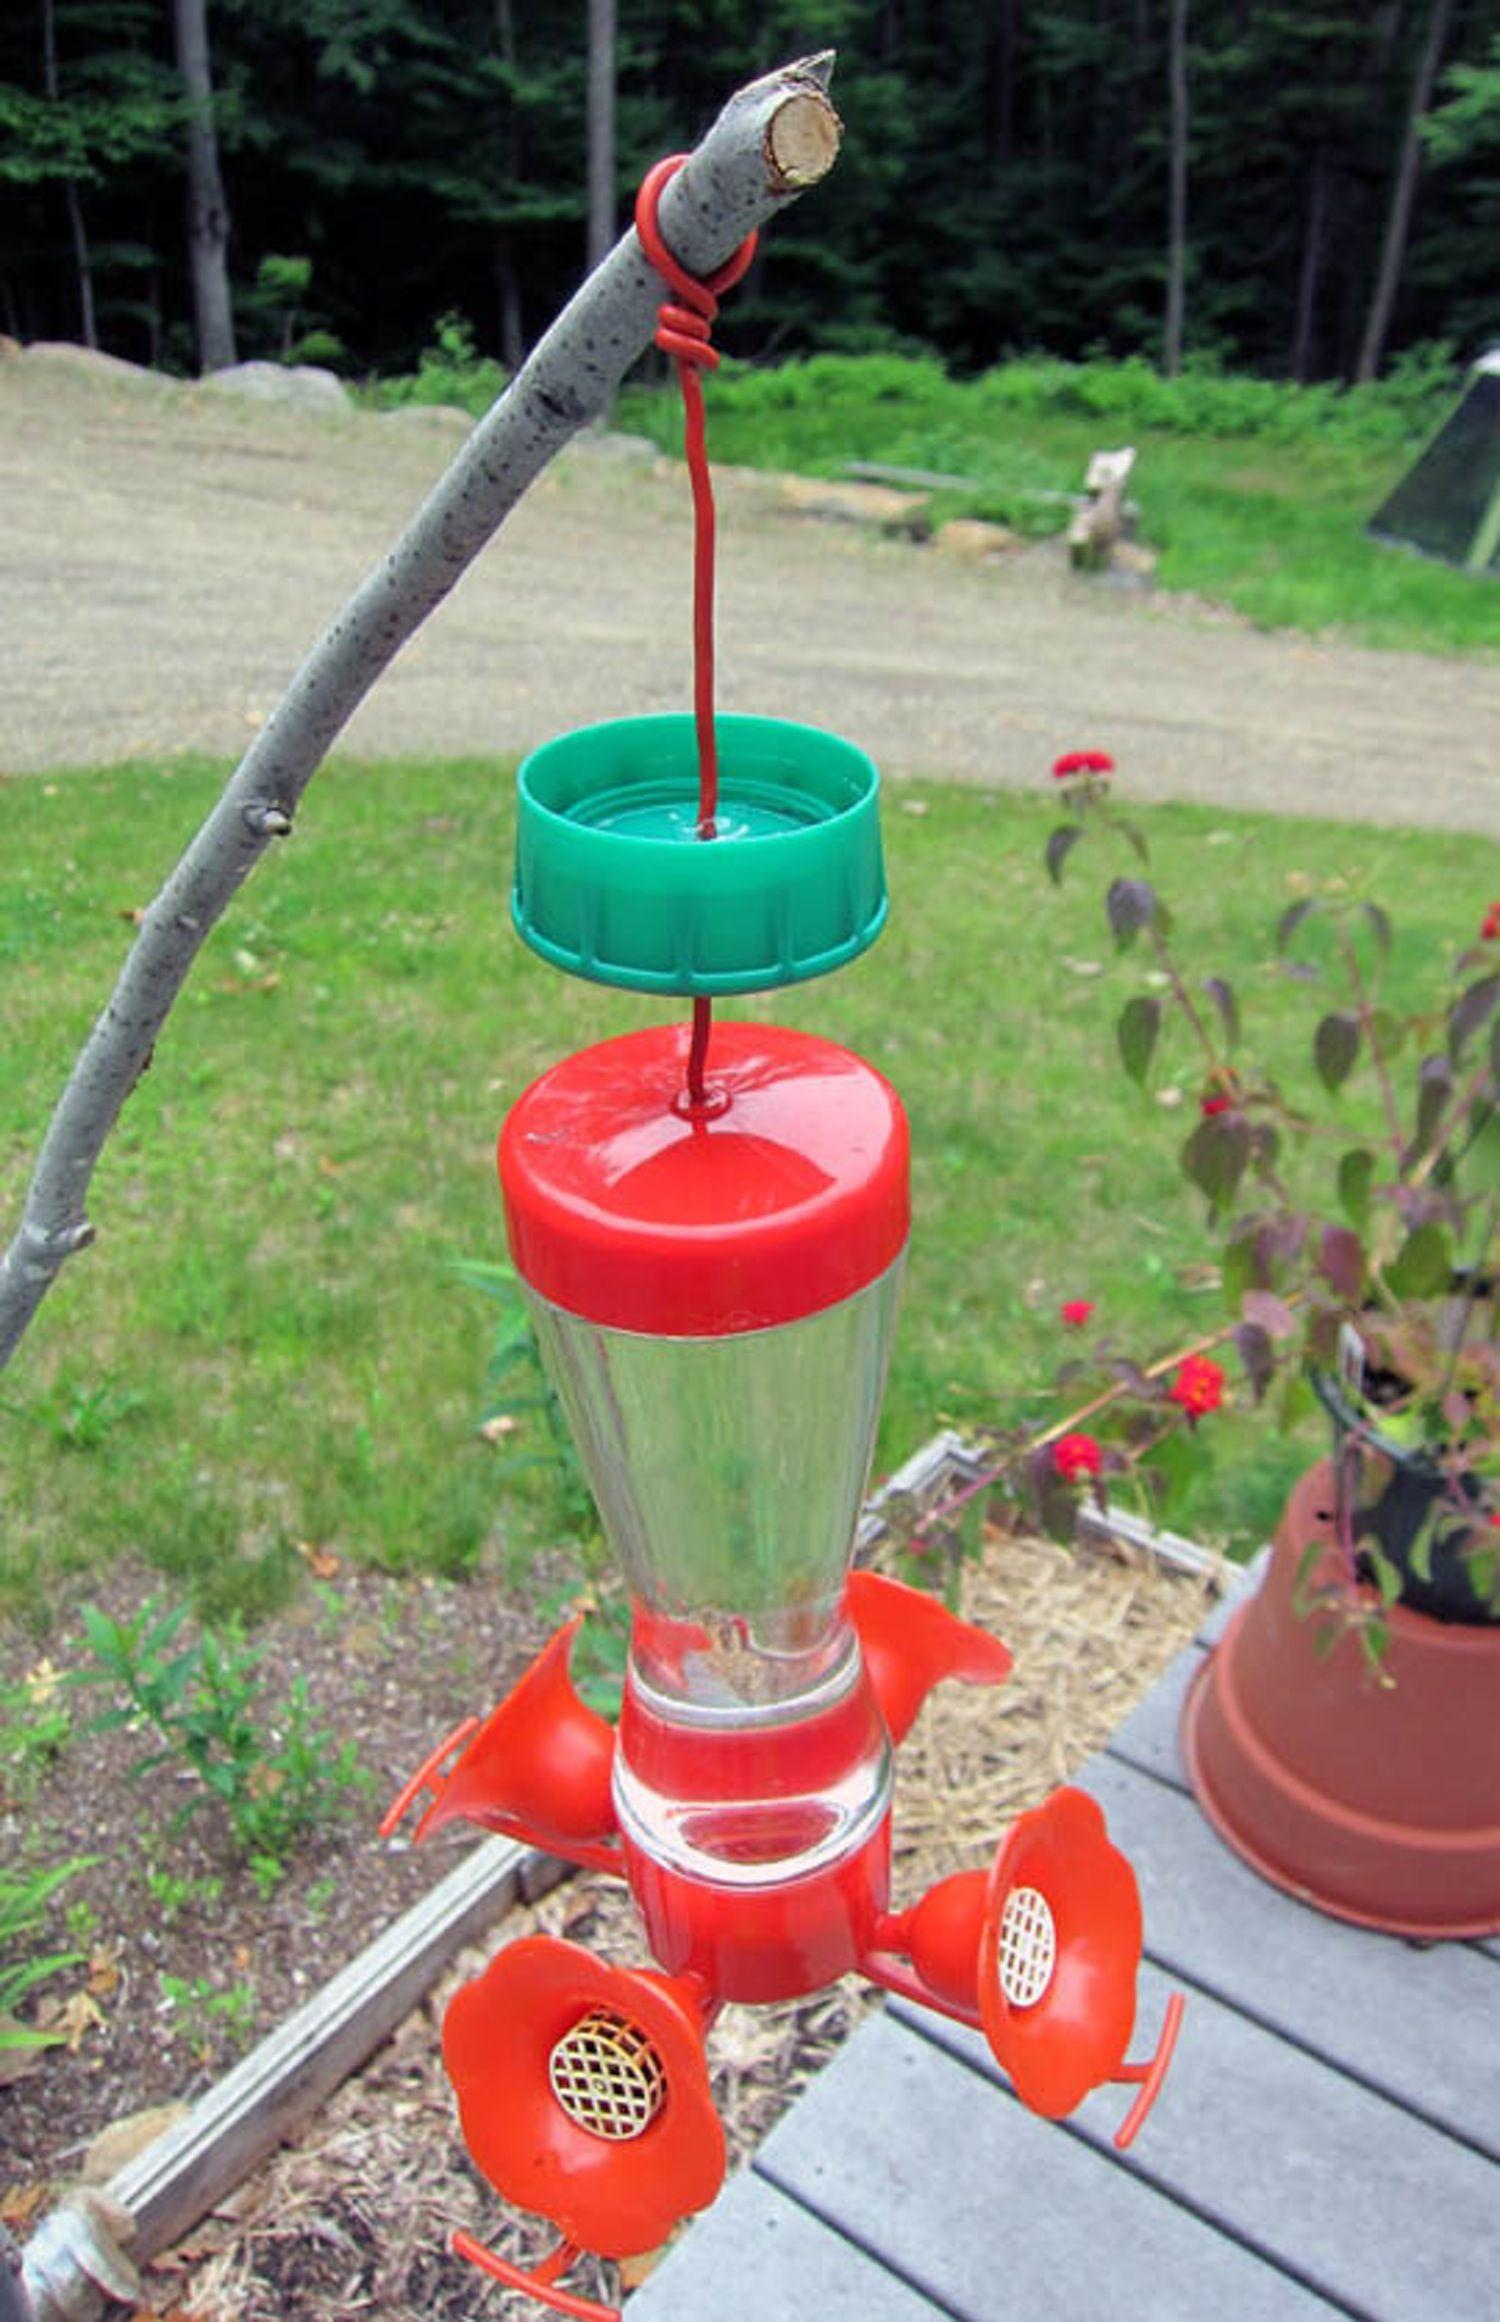 one to gallon file houses clean and ways baths healthy am feeders feeder easy jun hummingbird bird